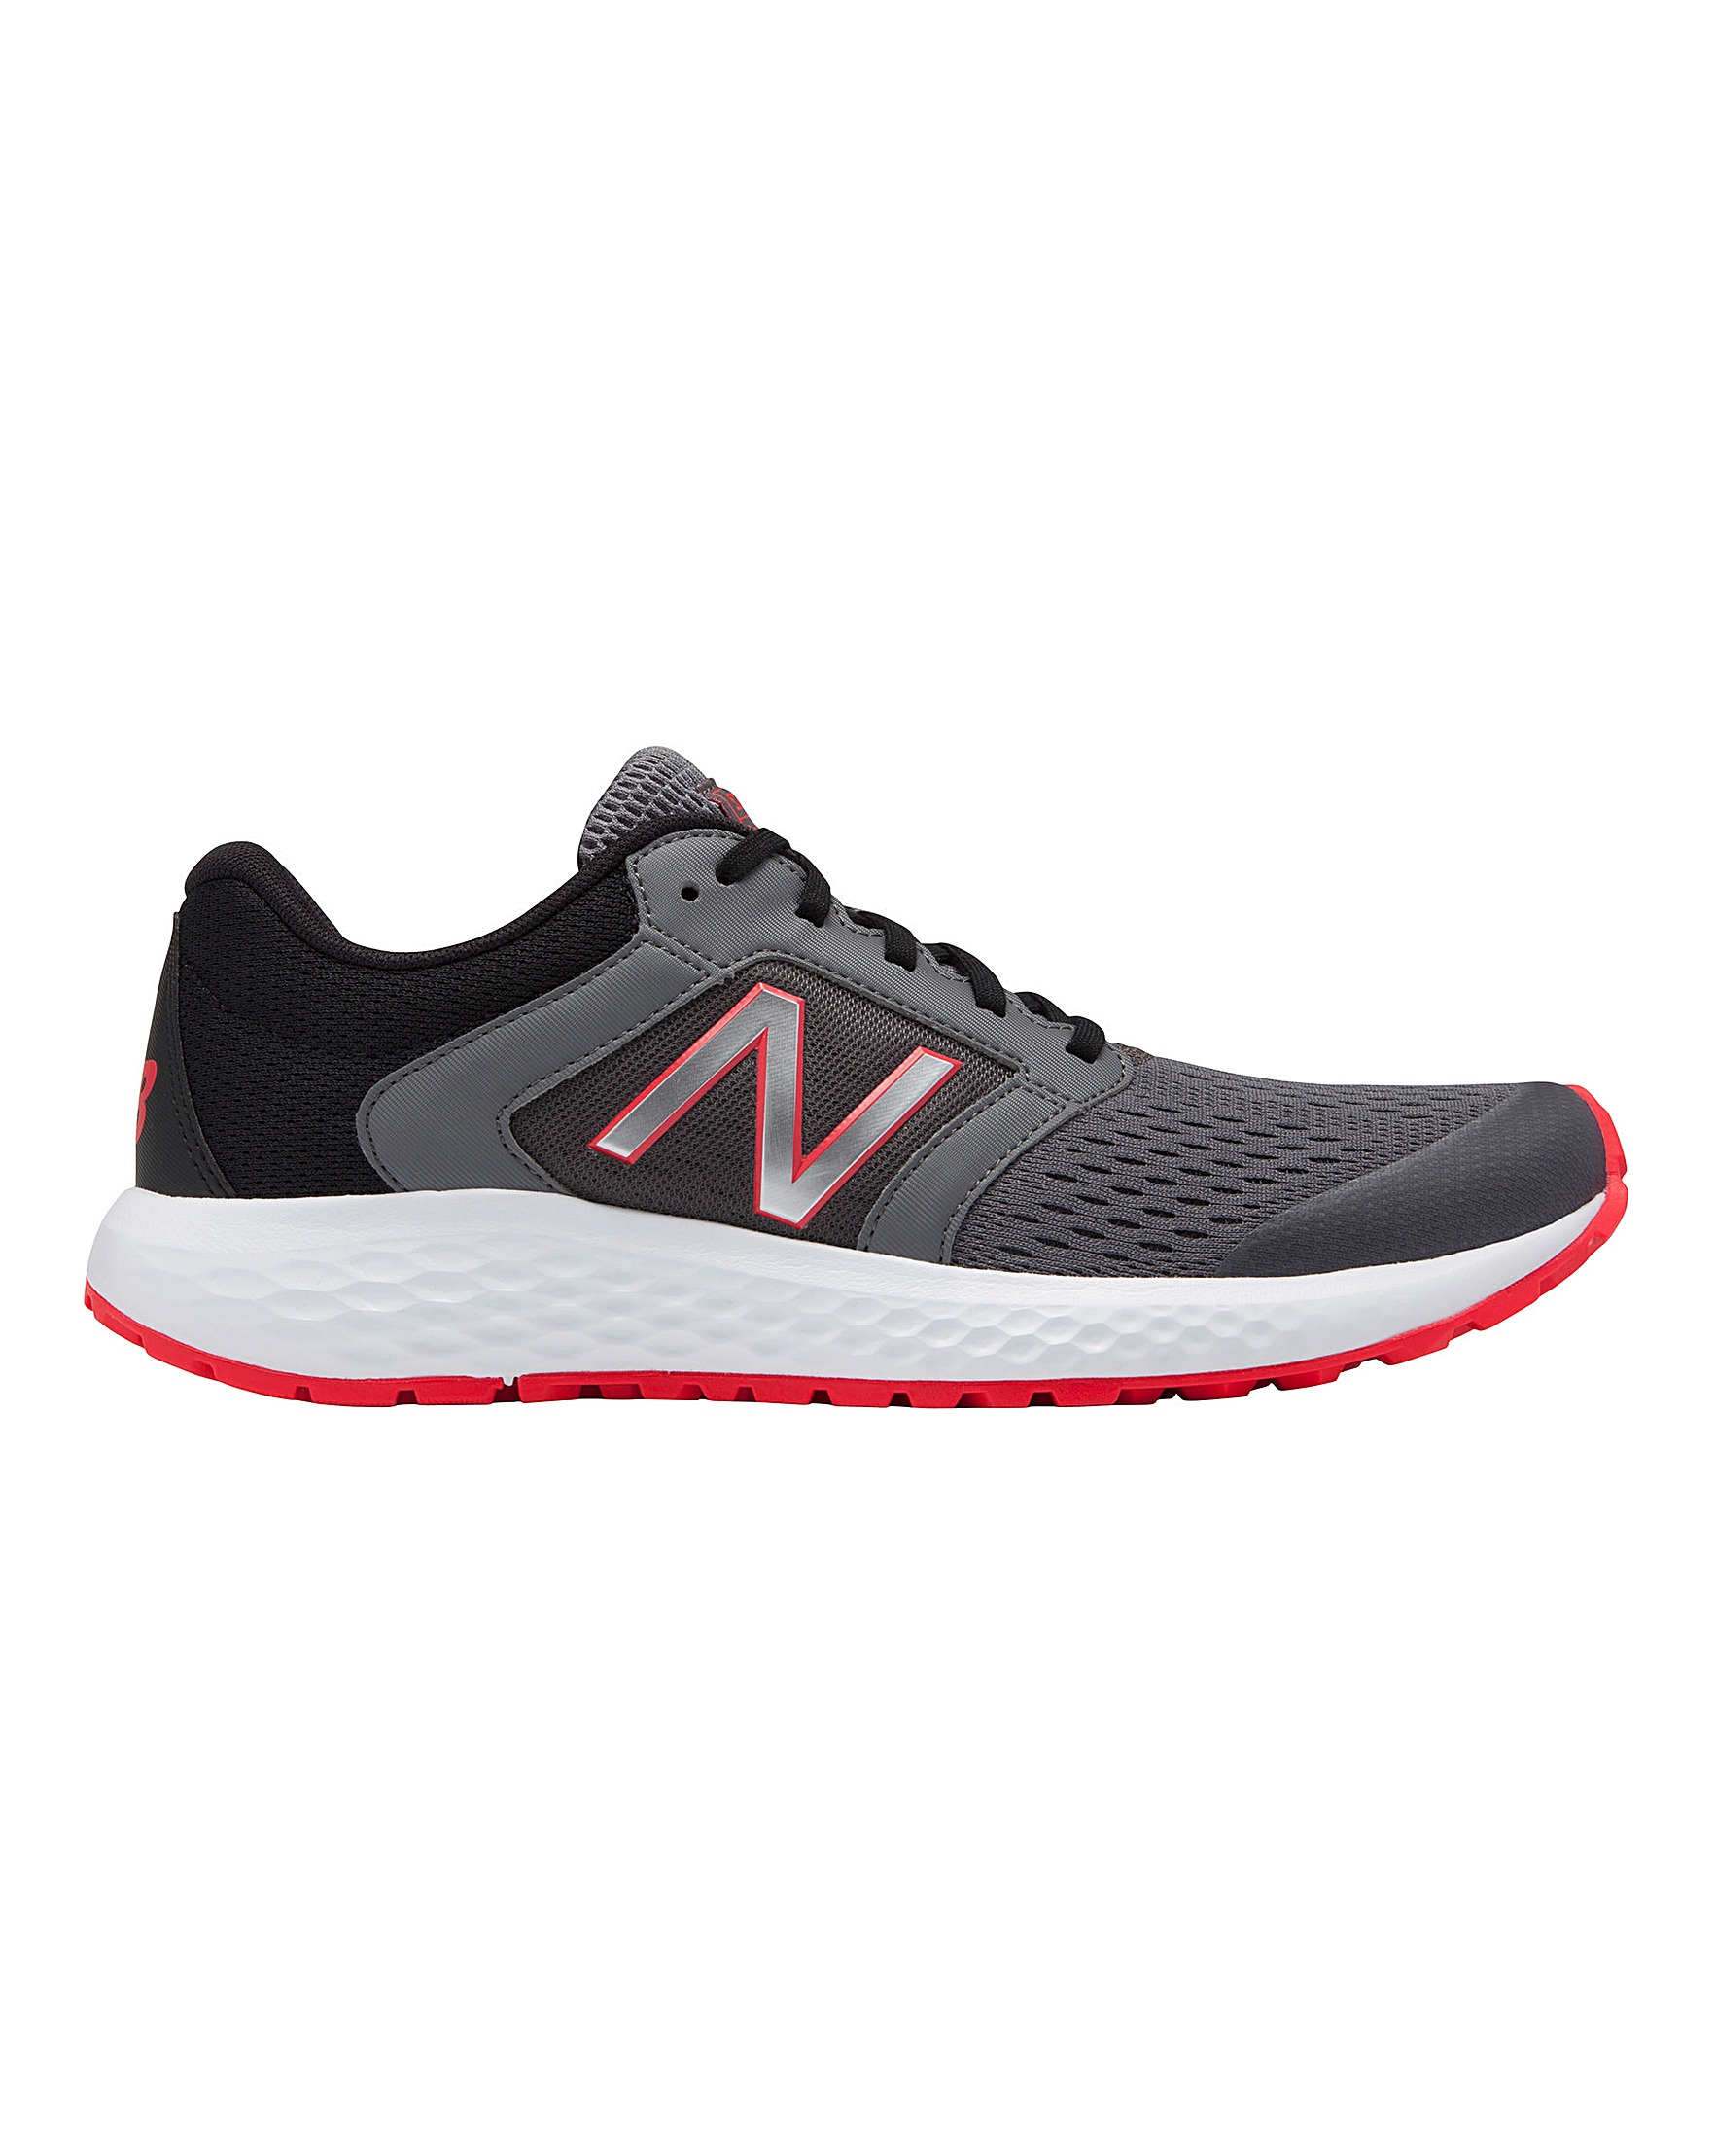 revendeur 30972 6ea98 New Balance 520 Trainers